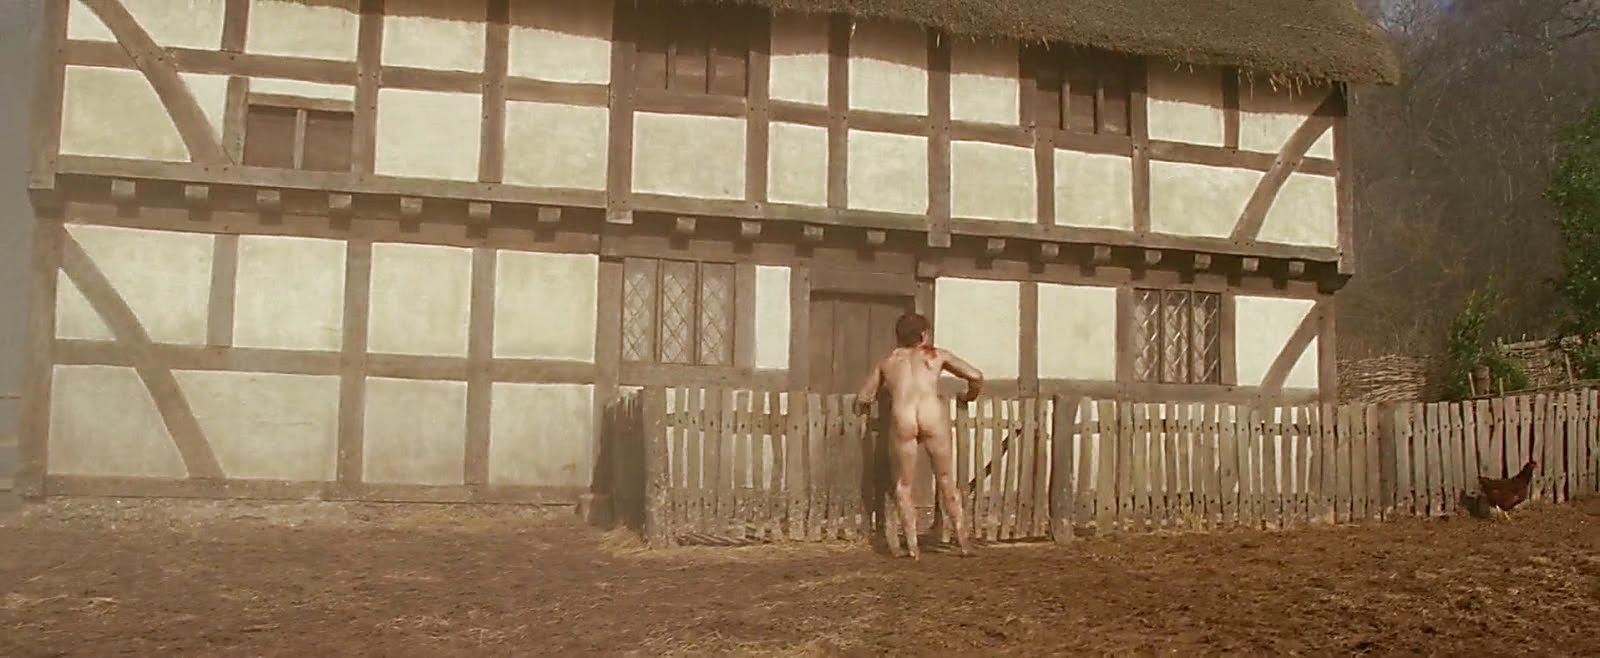 Freddie Fox sexy shirtless scene June 26, 2020, 3pm